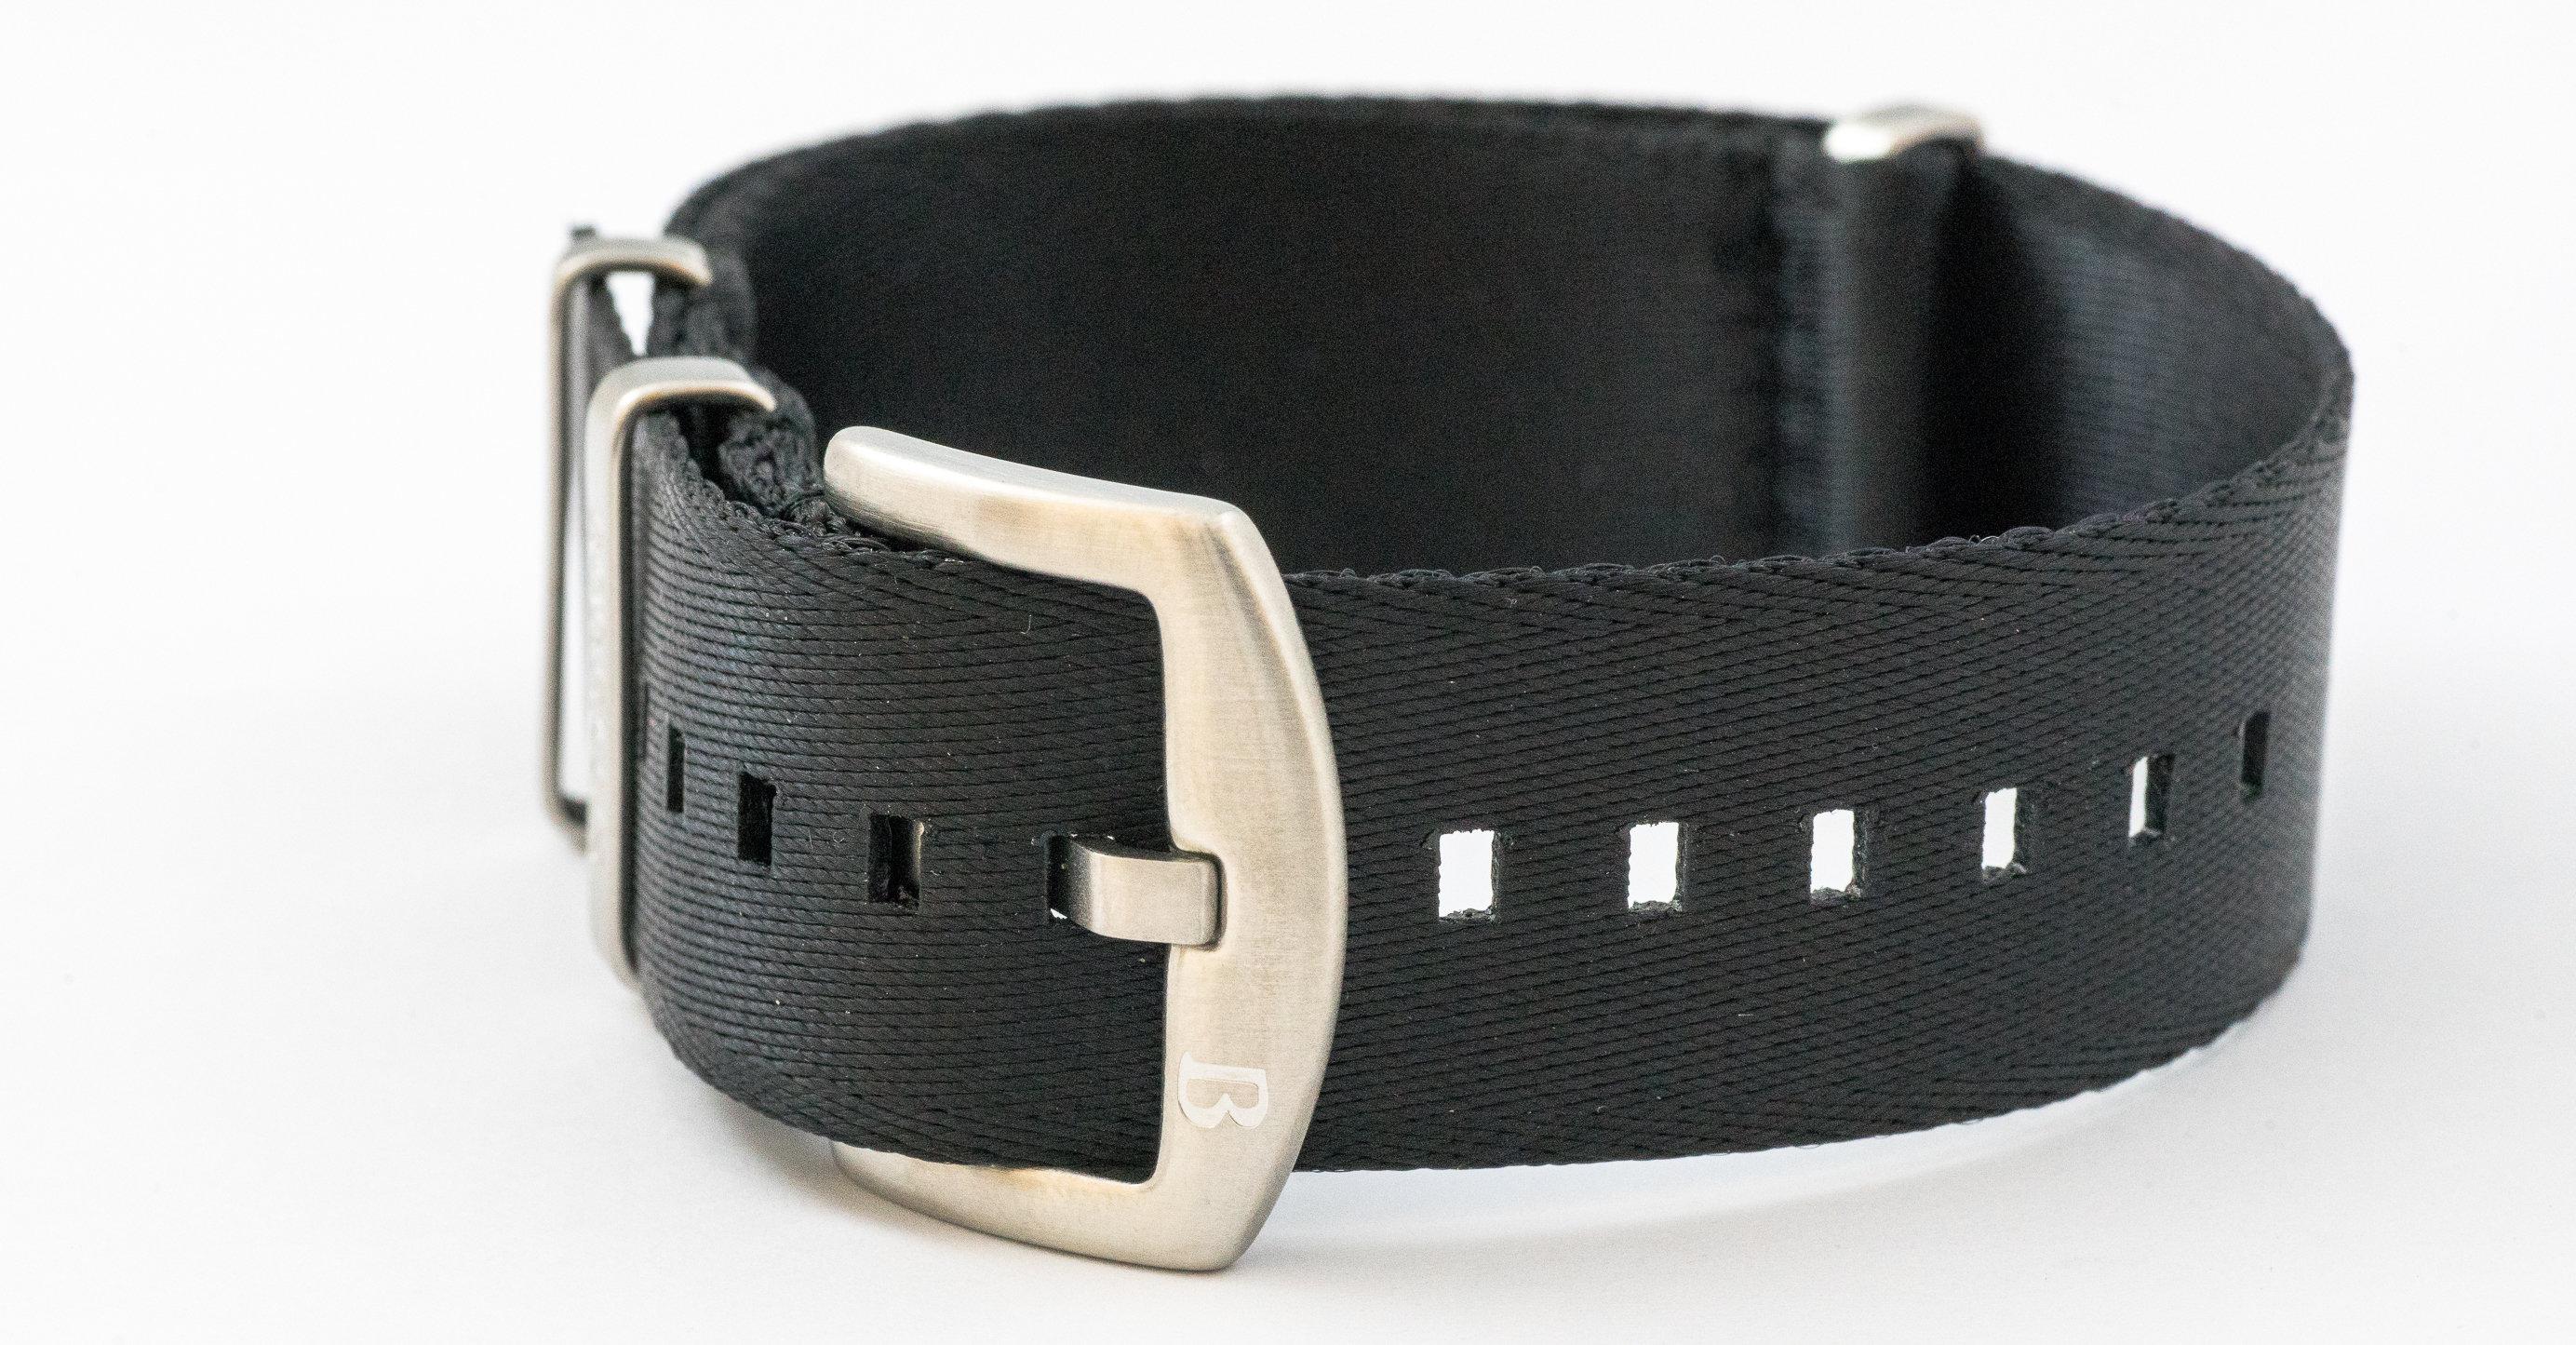 Borealis premium Nato style seatbelt 1.2mm nylon weave strap 22mm size black